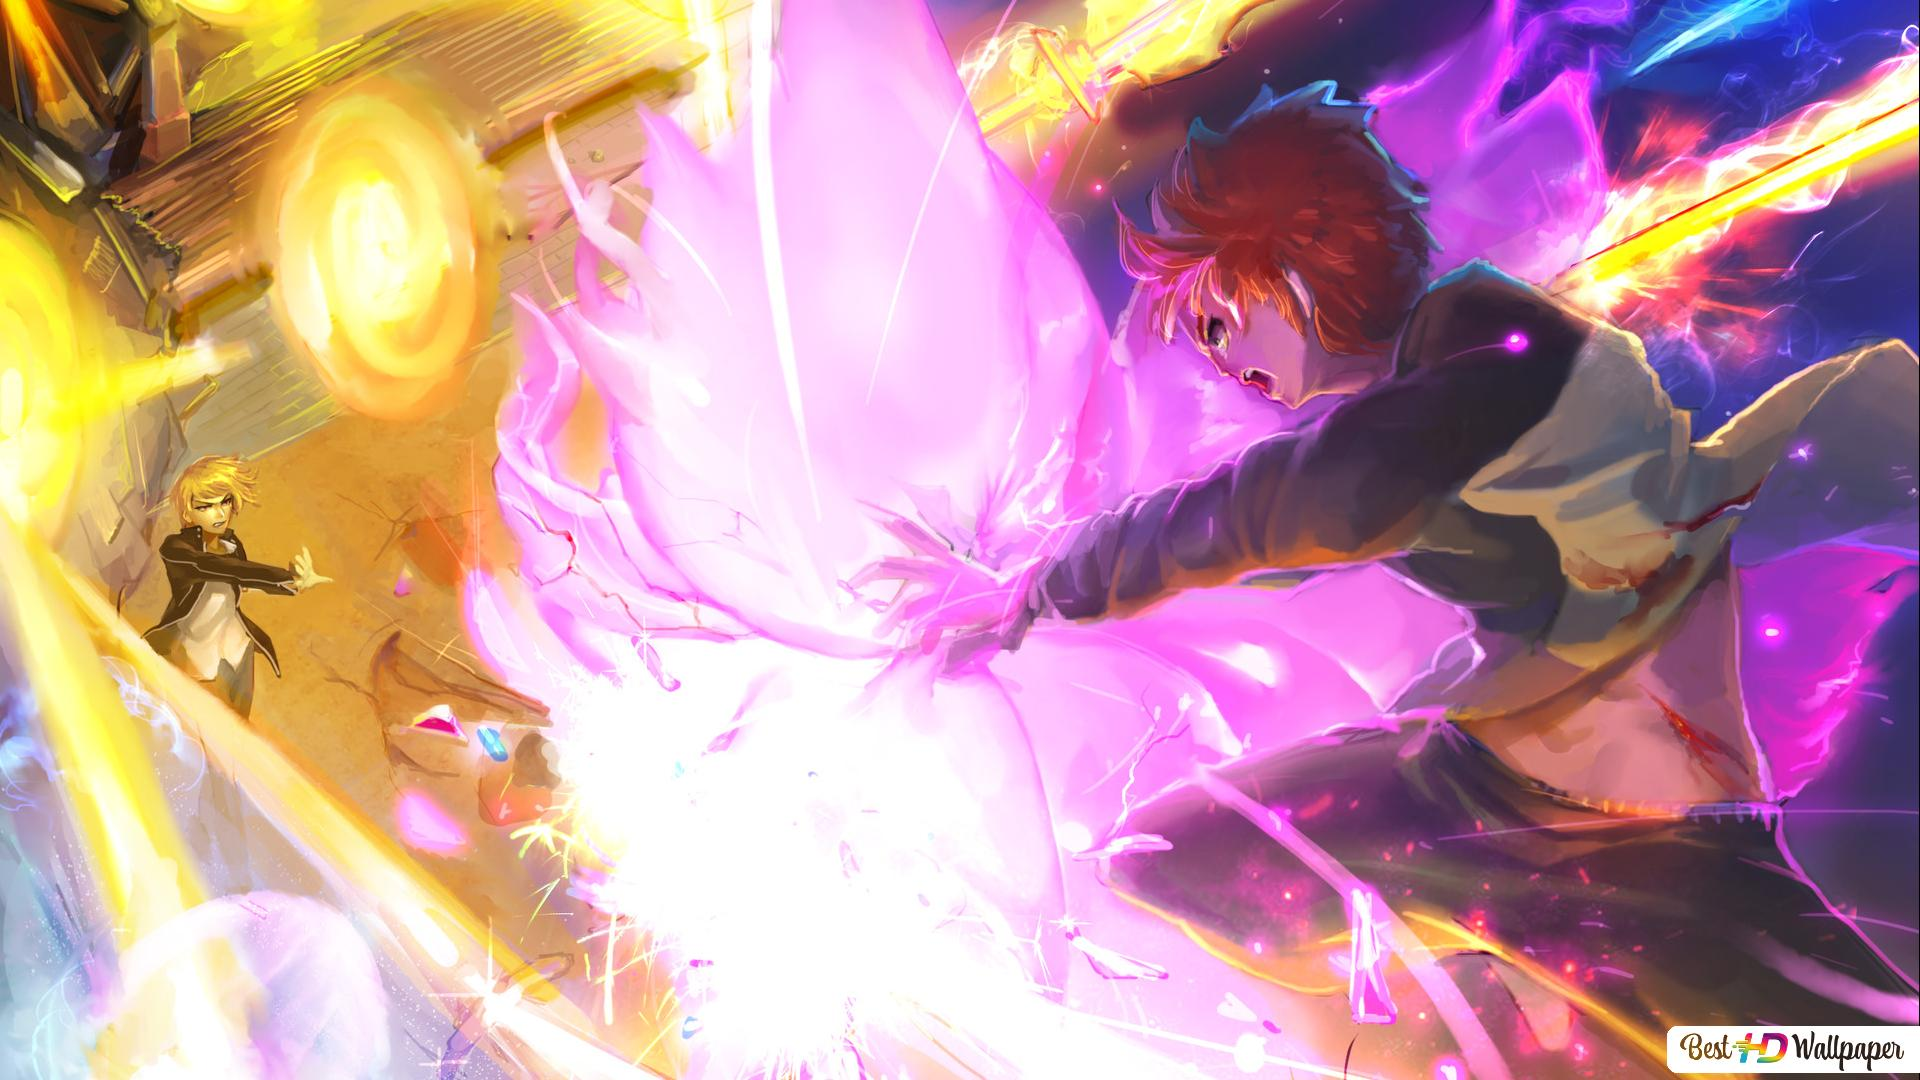 Fate Stay Night Unlimited Blade Works Gilgamesh Vs Shirou Emiya Hd Wallpaper Download